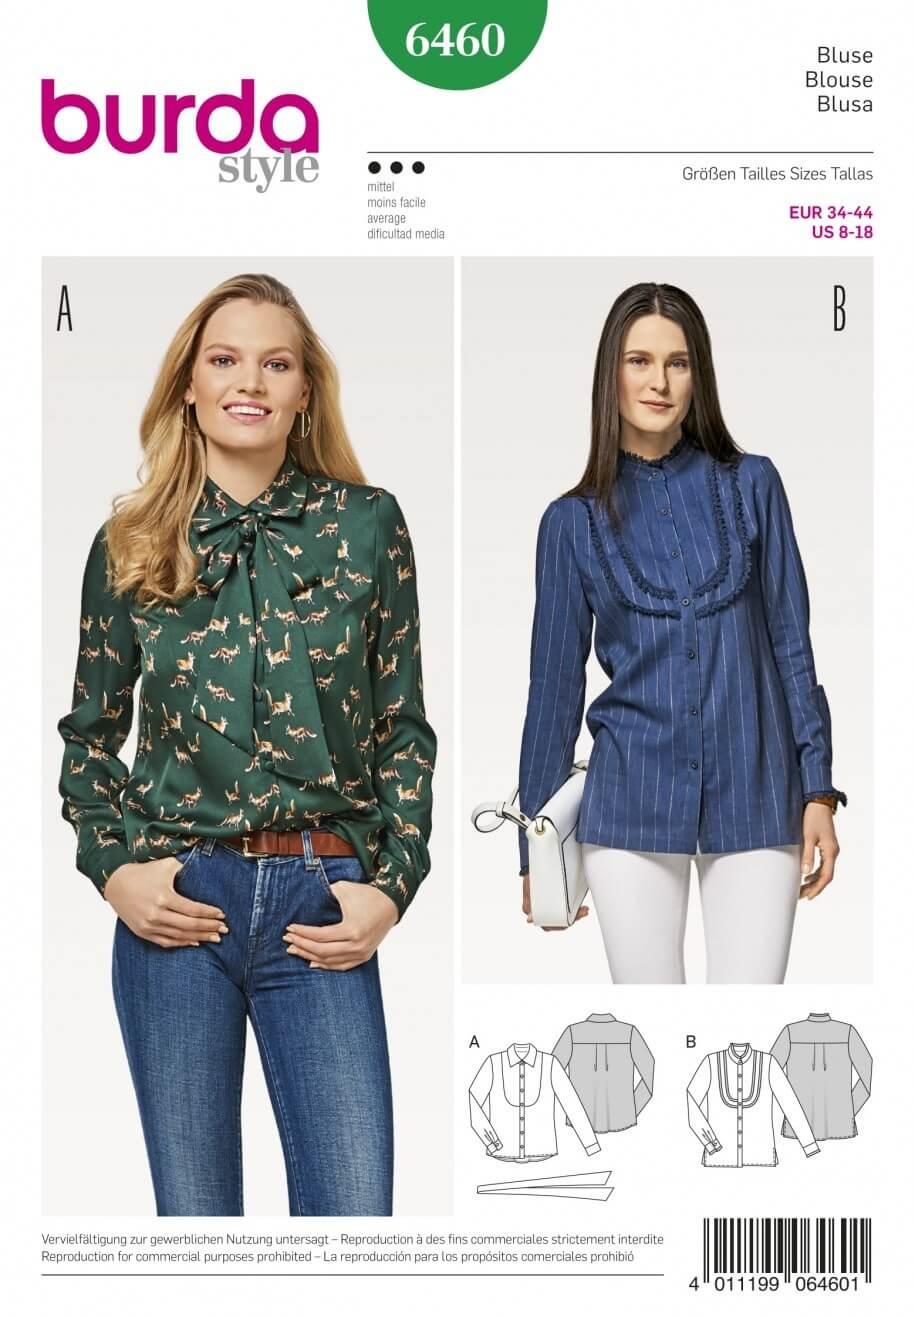 Burda Style Women's Collared Shirt Blouse Dress Sewing Pattern 6460